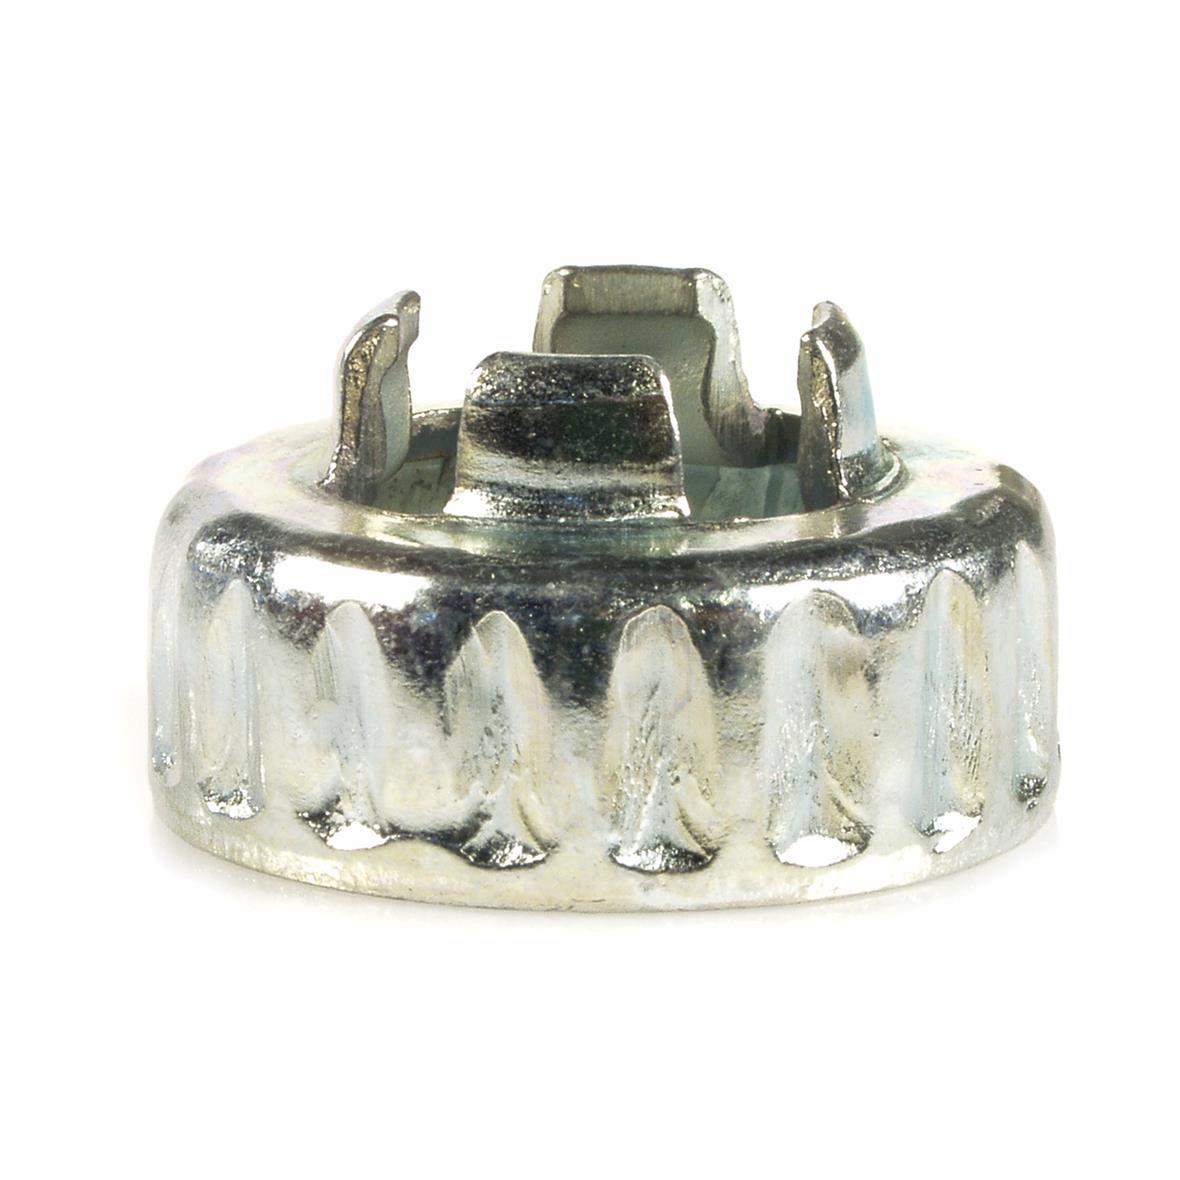 Product Image for 'Locking Washer brake drumTitle'